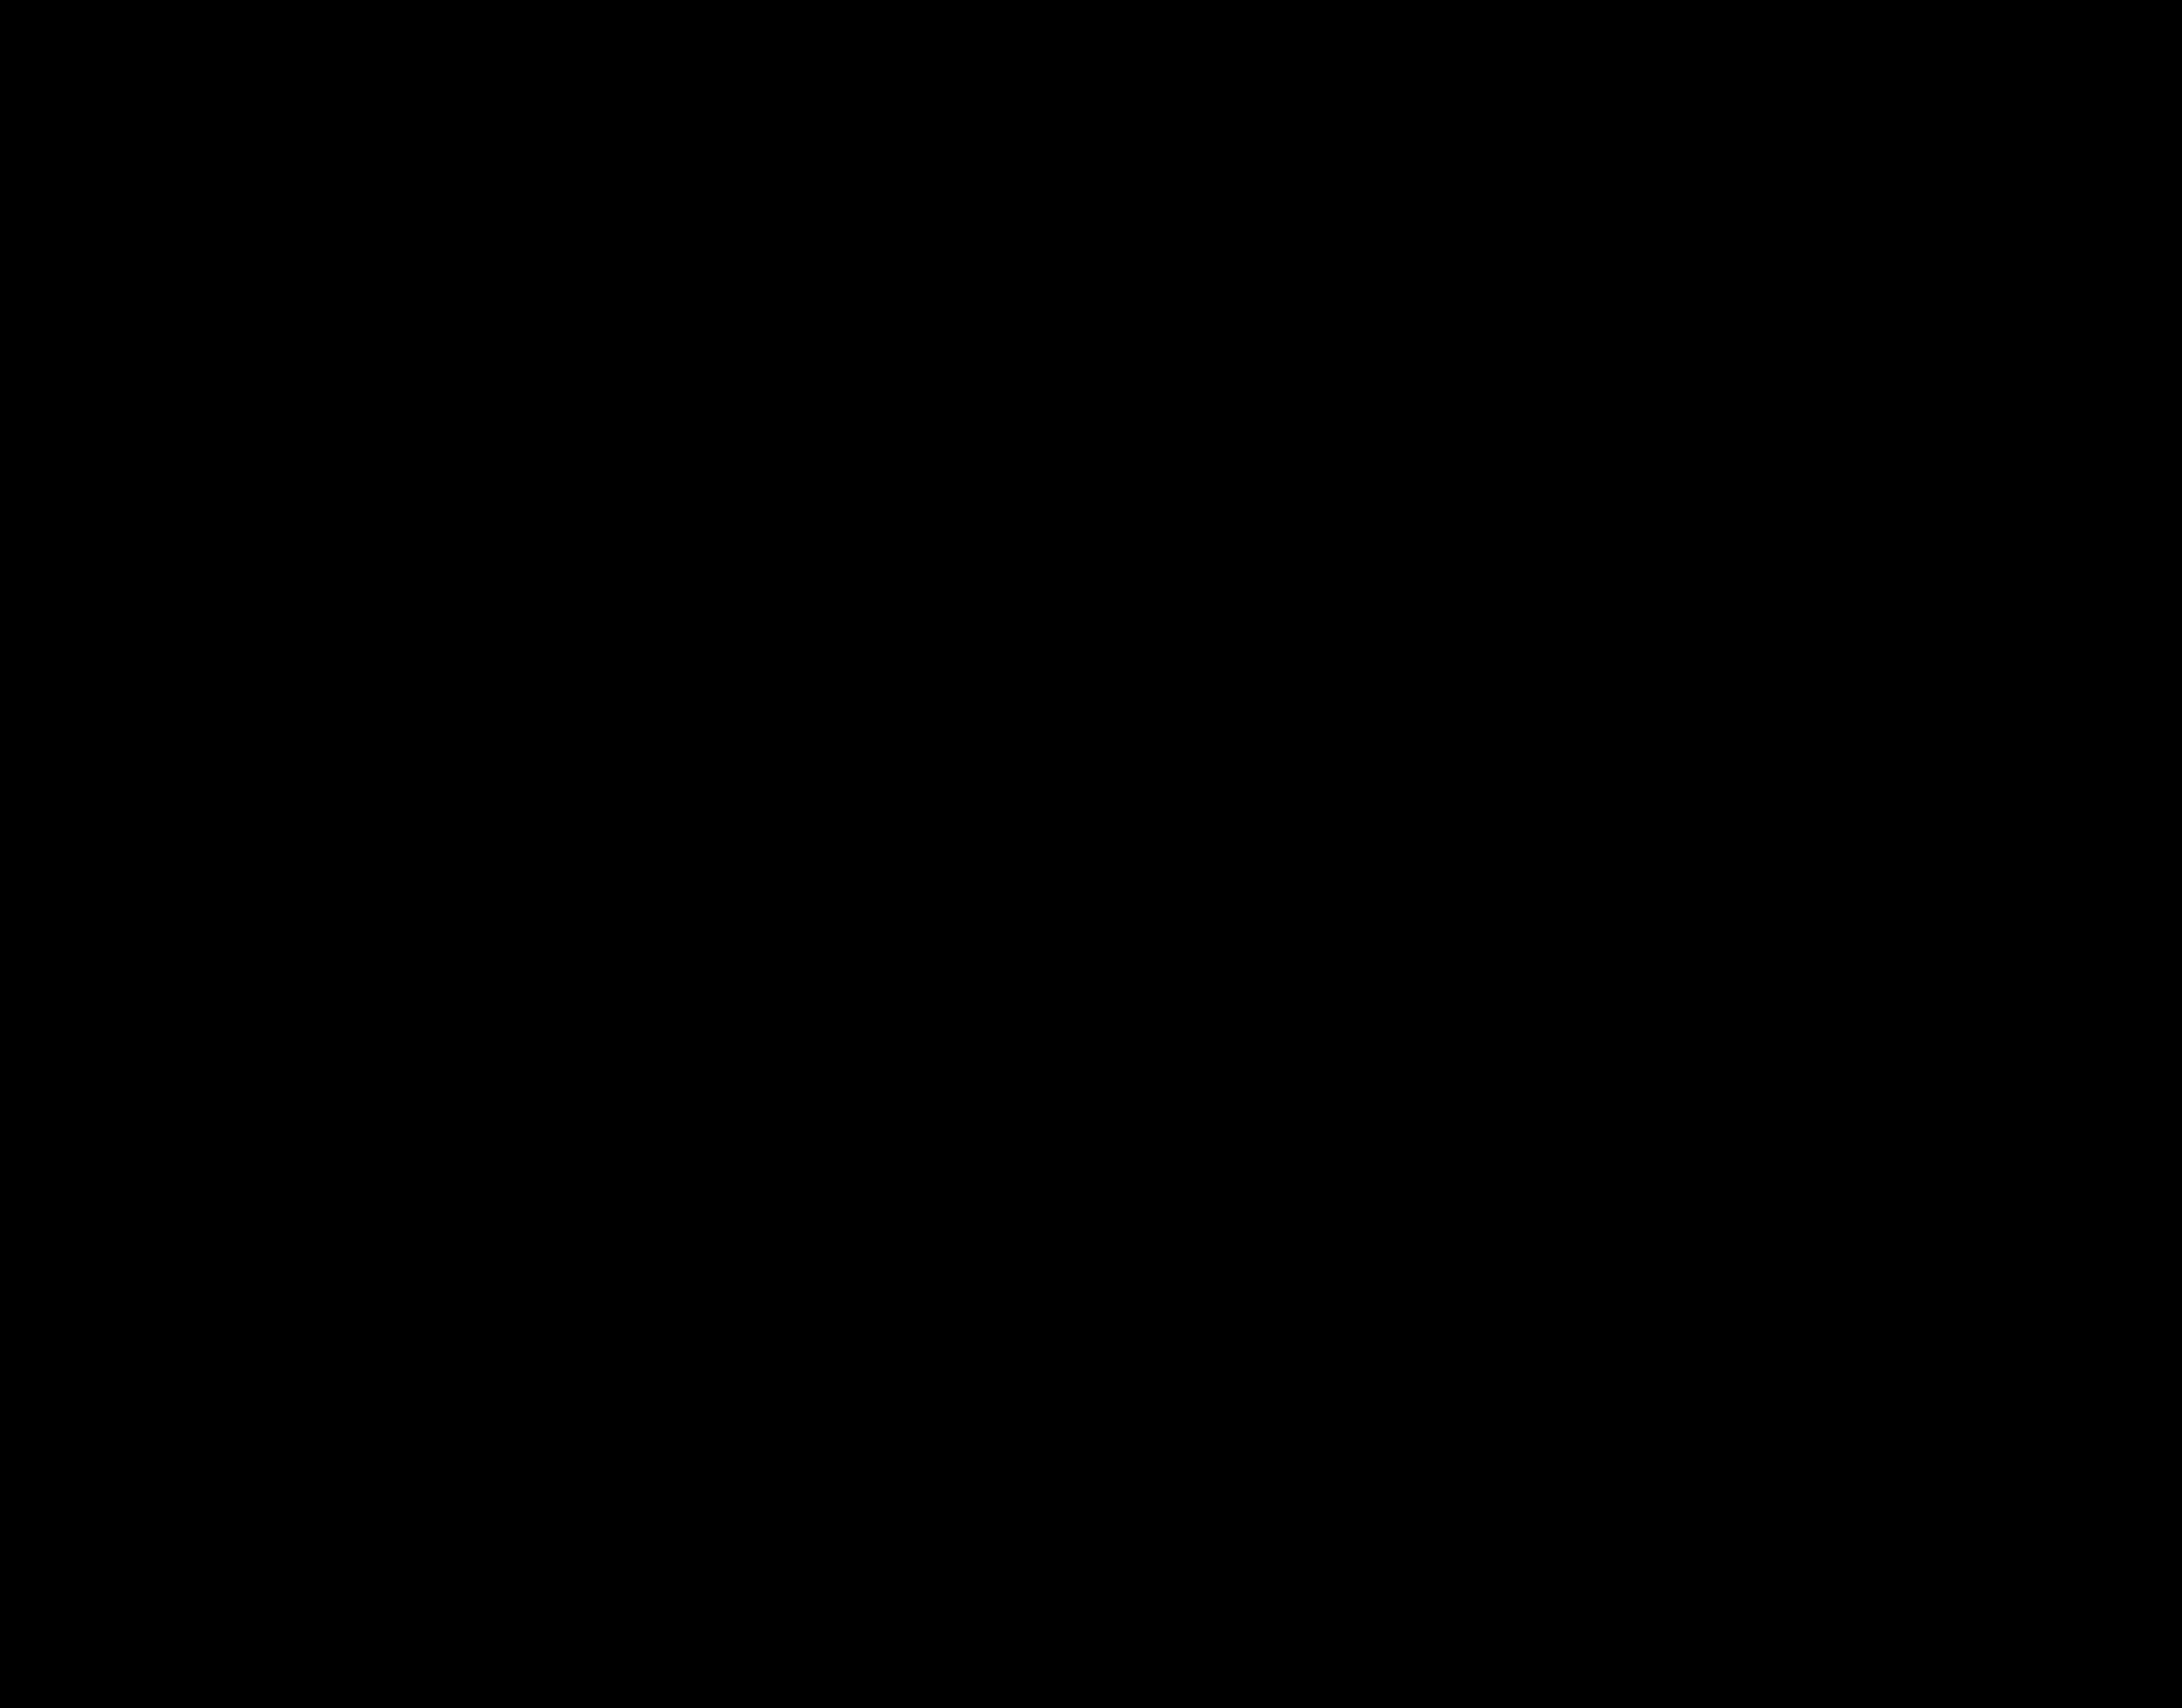 PNG Jockey - 51903